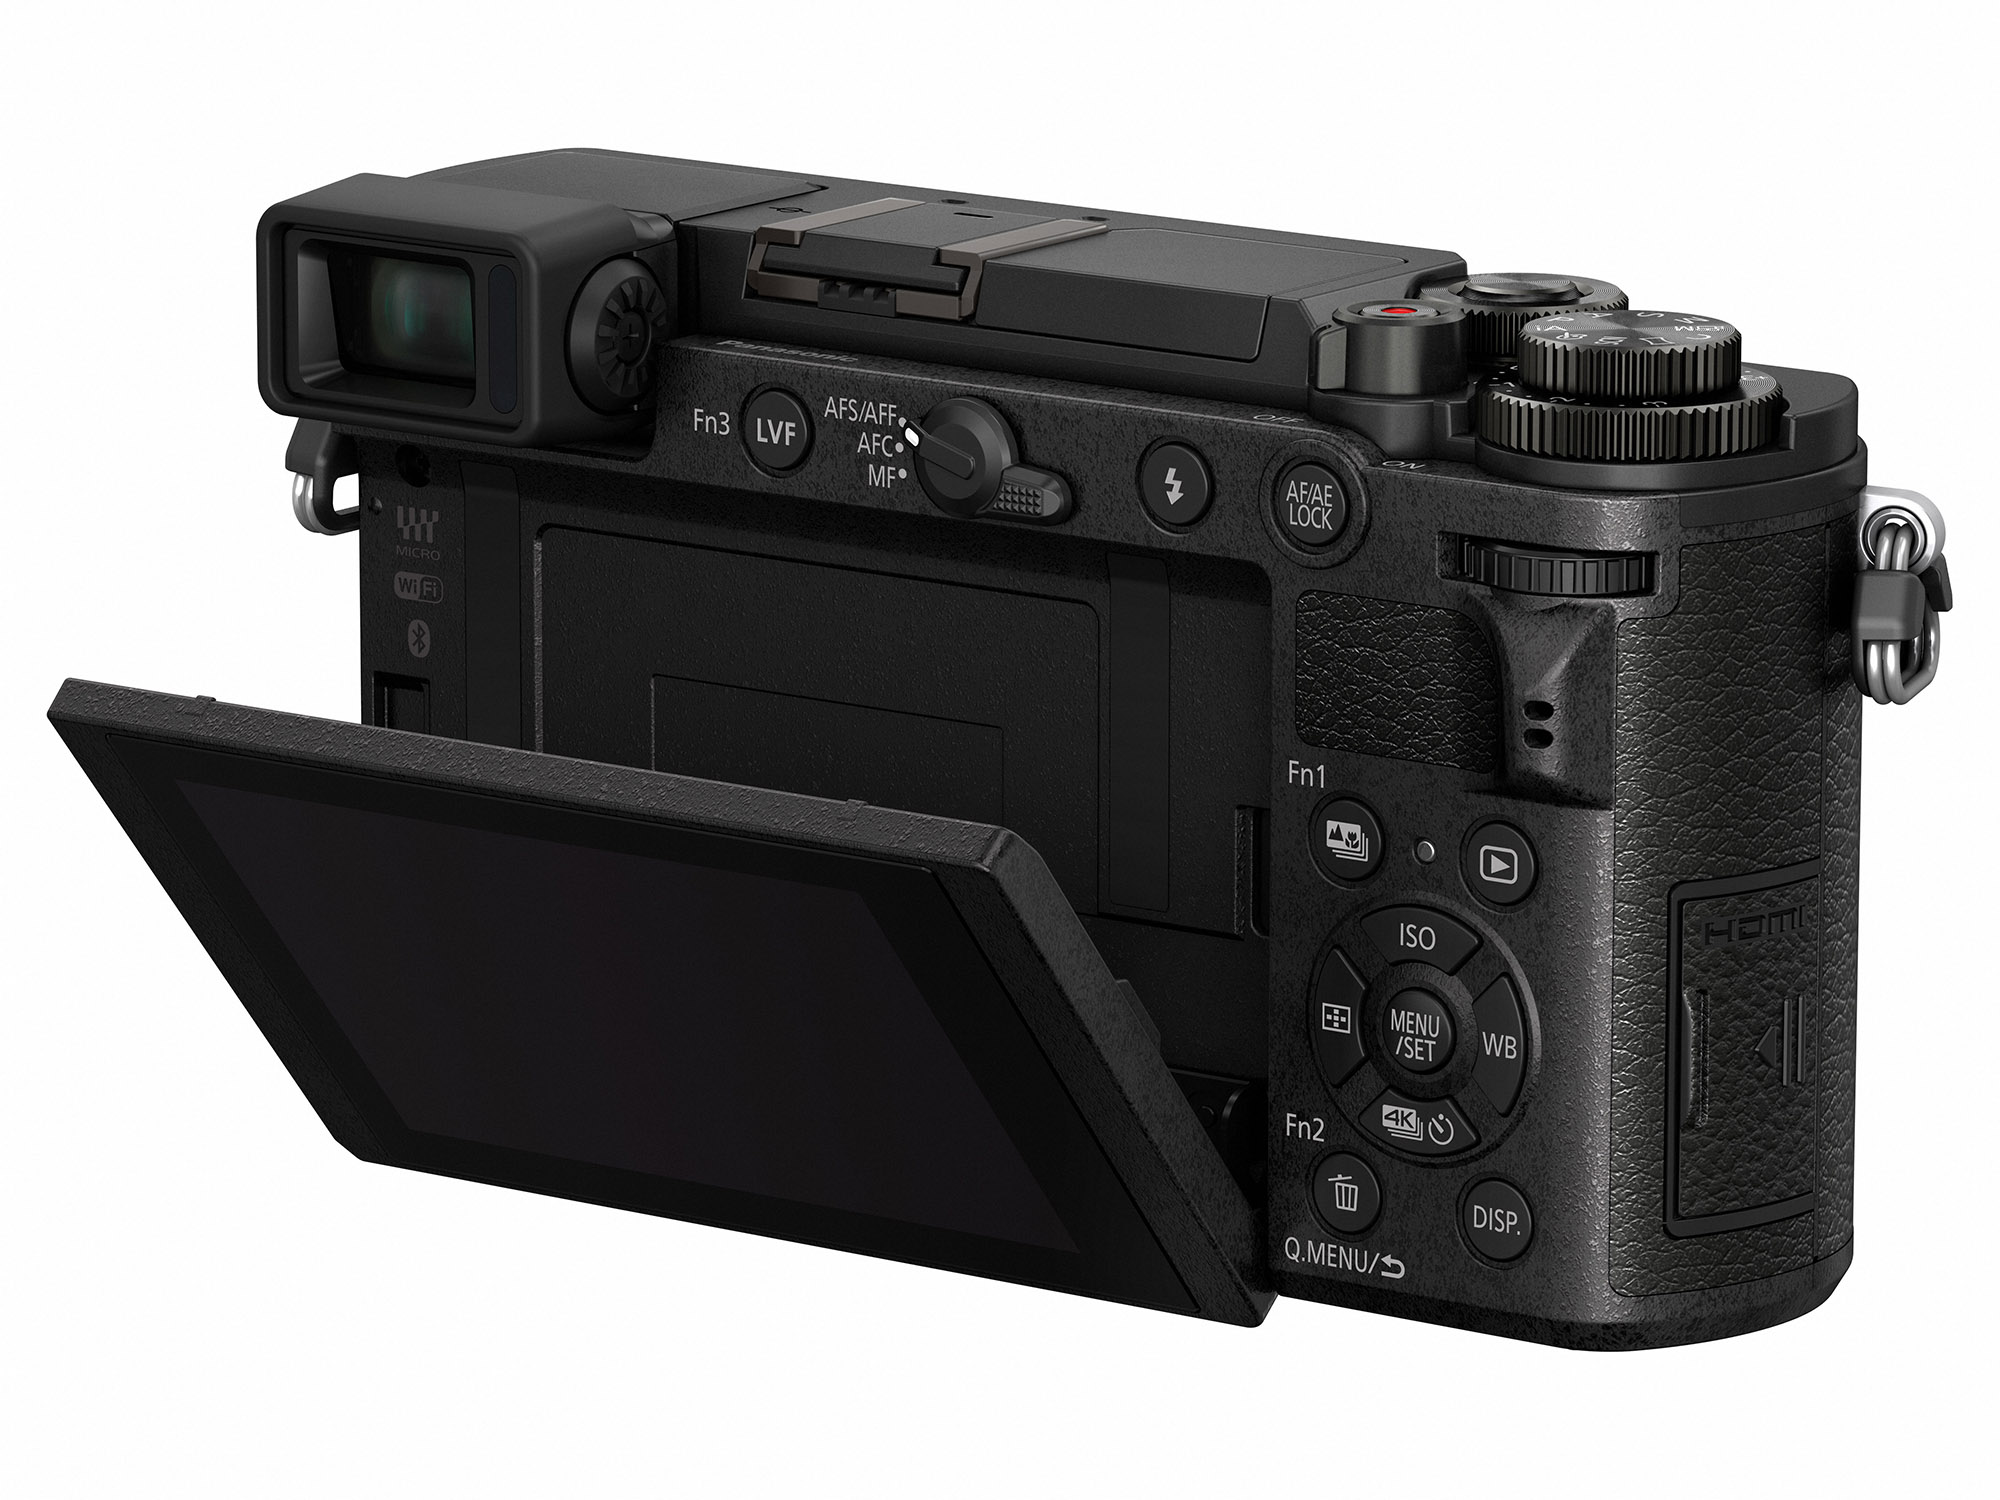 Panasonic GX9 si ecranl sau rabatabil doar vertical, nu si orizontal